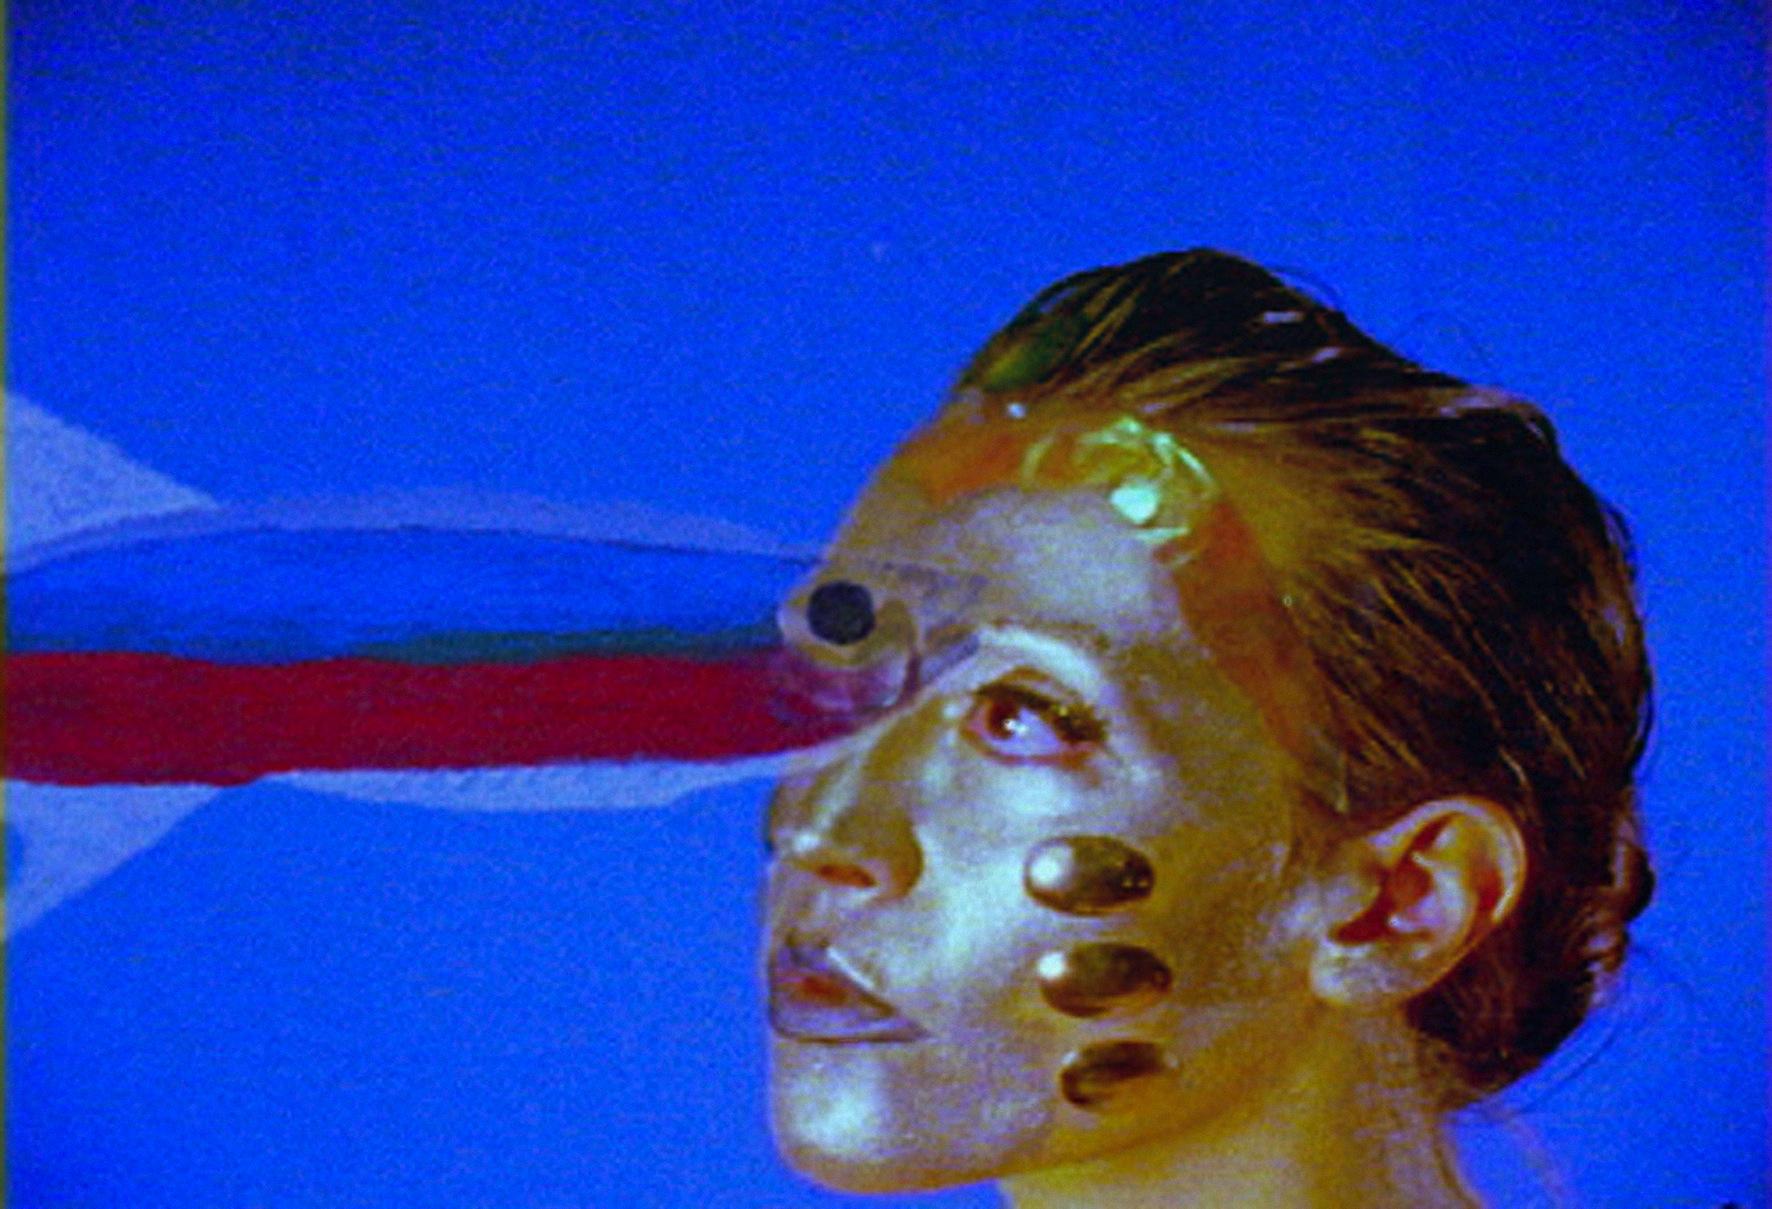 "Distruktur (Melissa Dullius & Gustavo Jahn), ""5 truly false clues (prologue of the film Éternau)"", 2006, film still. Courtesy the artist."